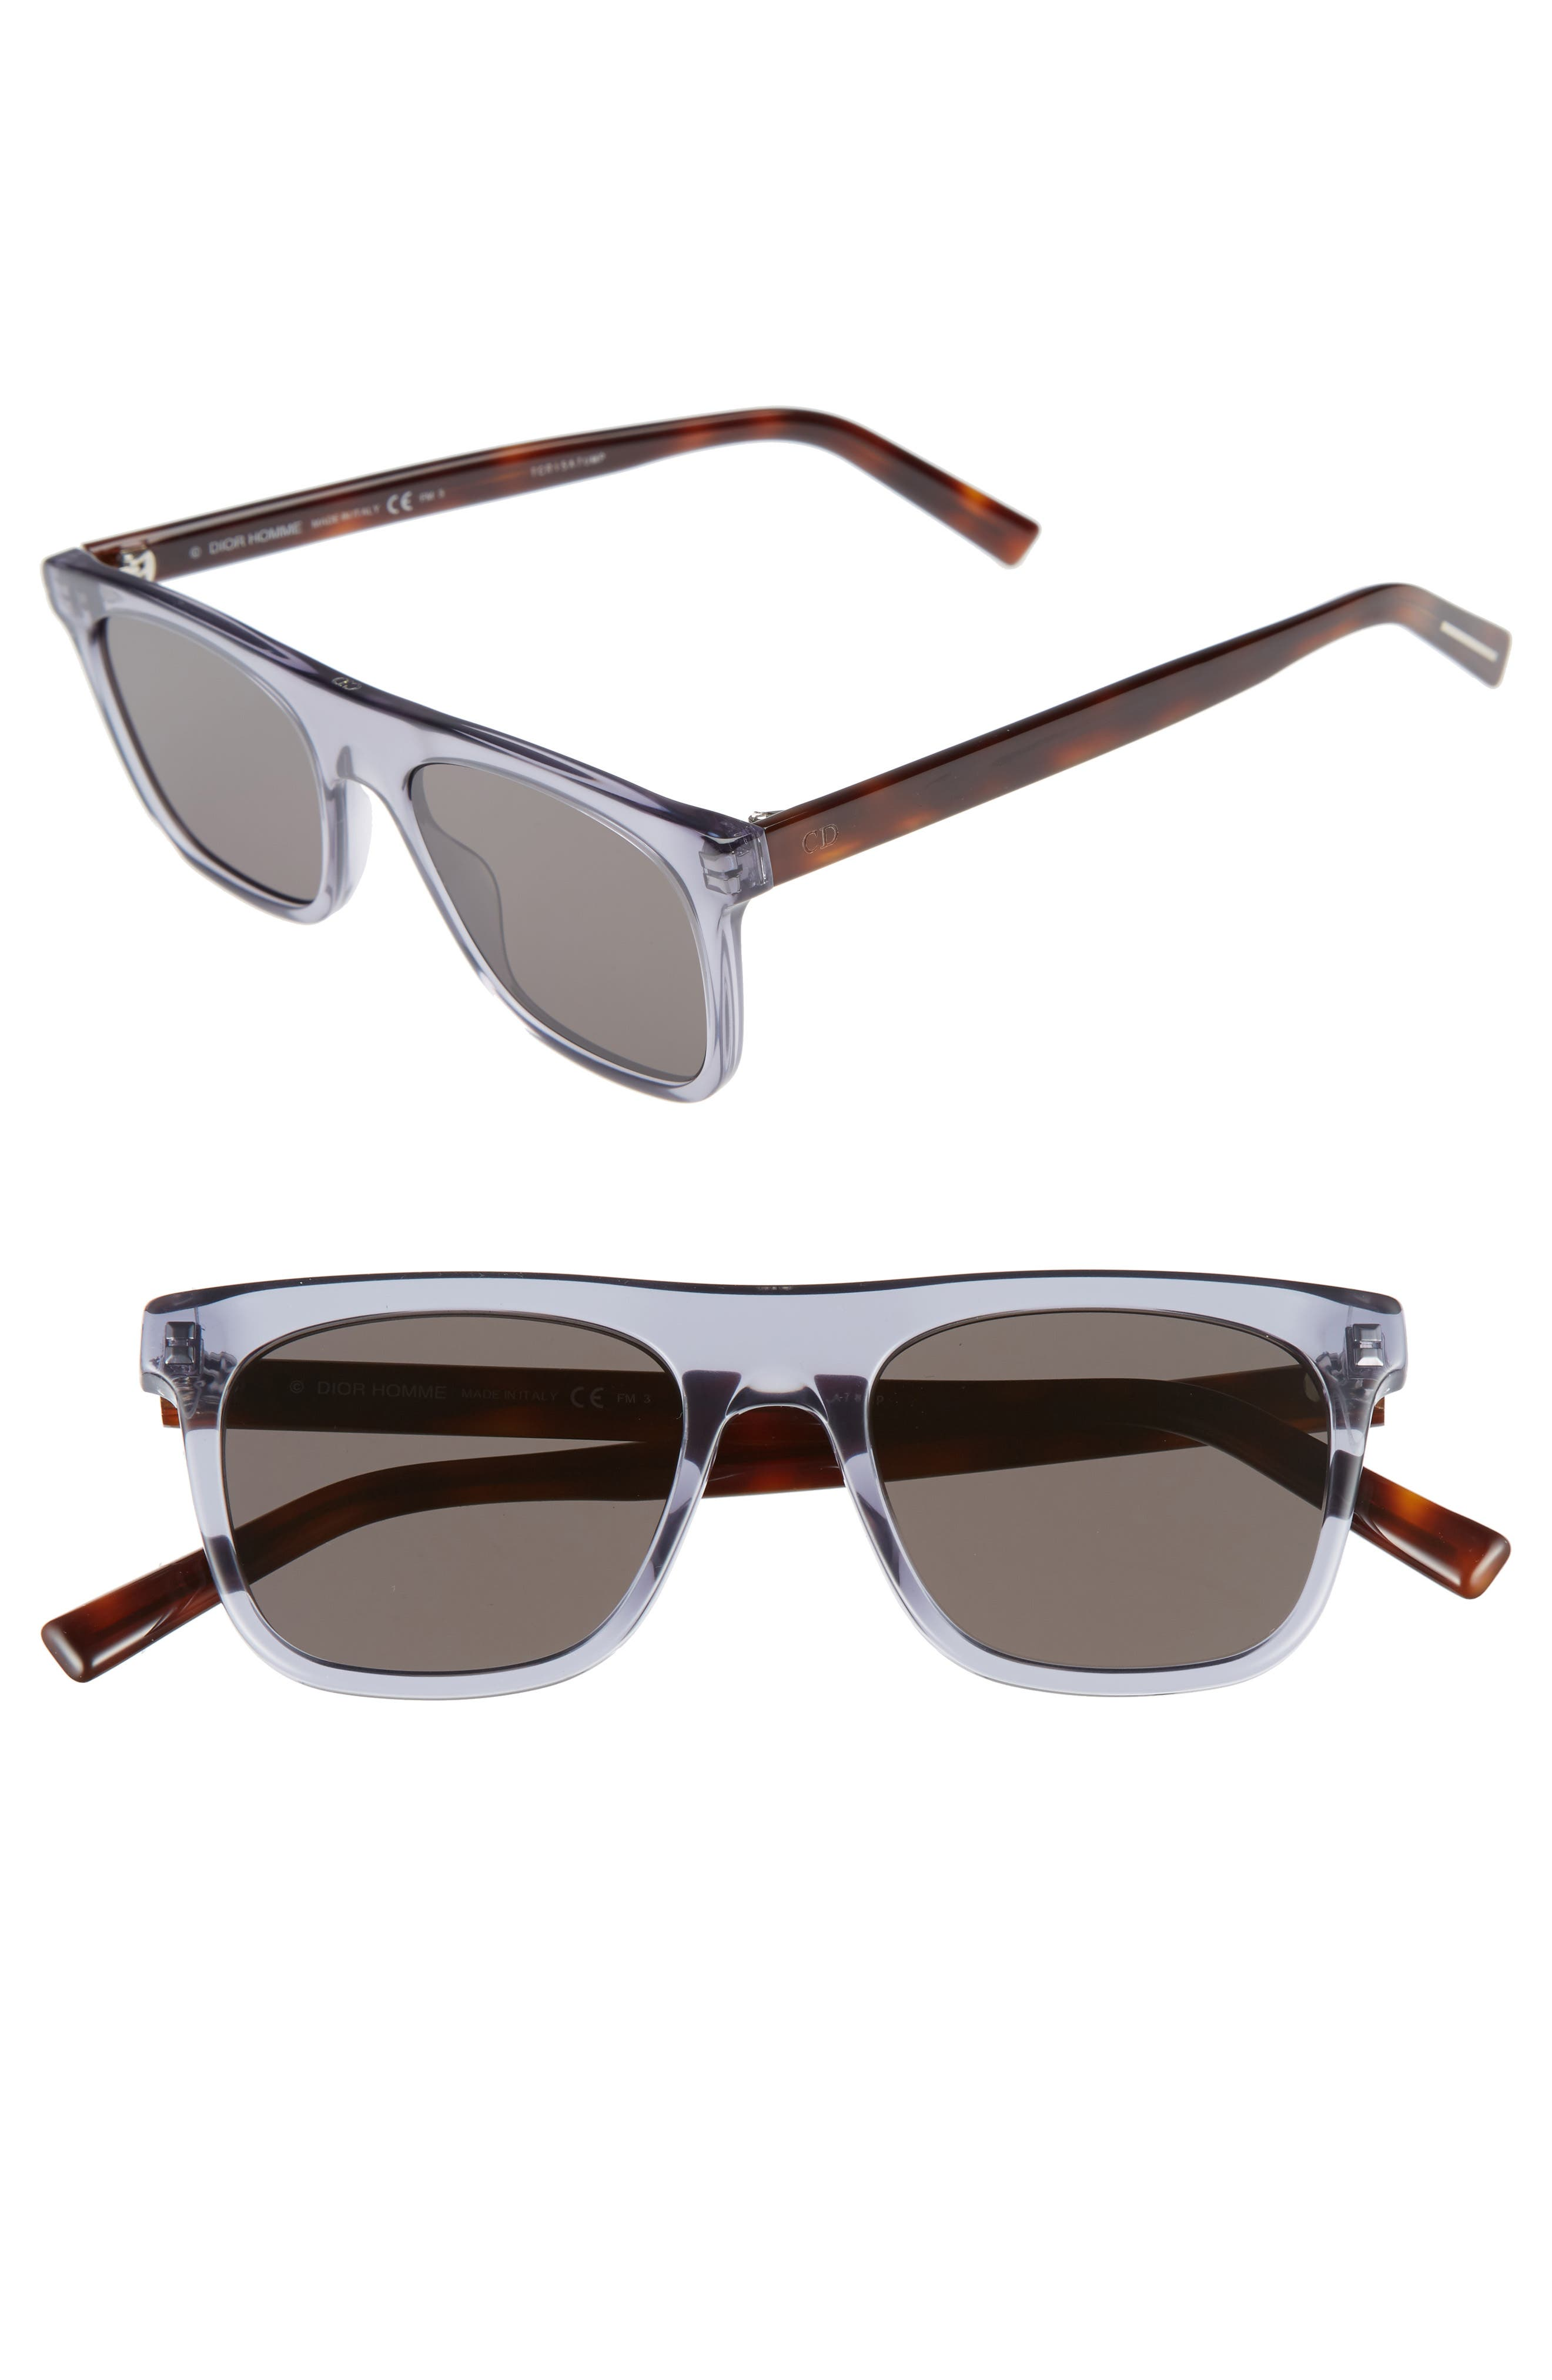 Dior Walk 51mm Sunglasses,                             Main thumbnail 1, color,